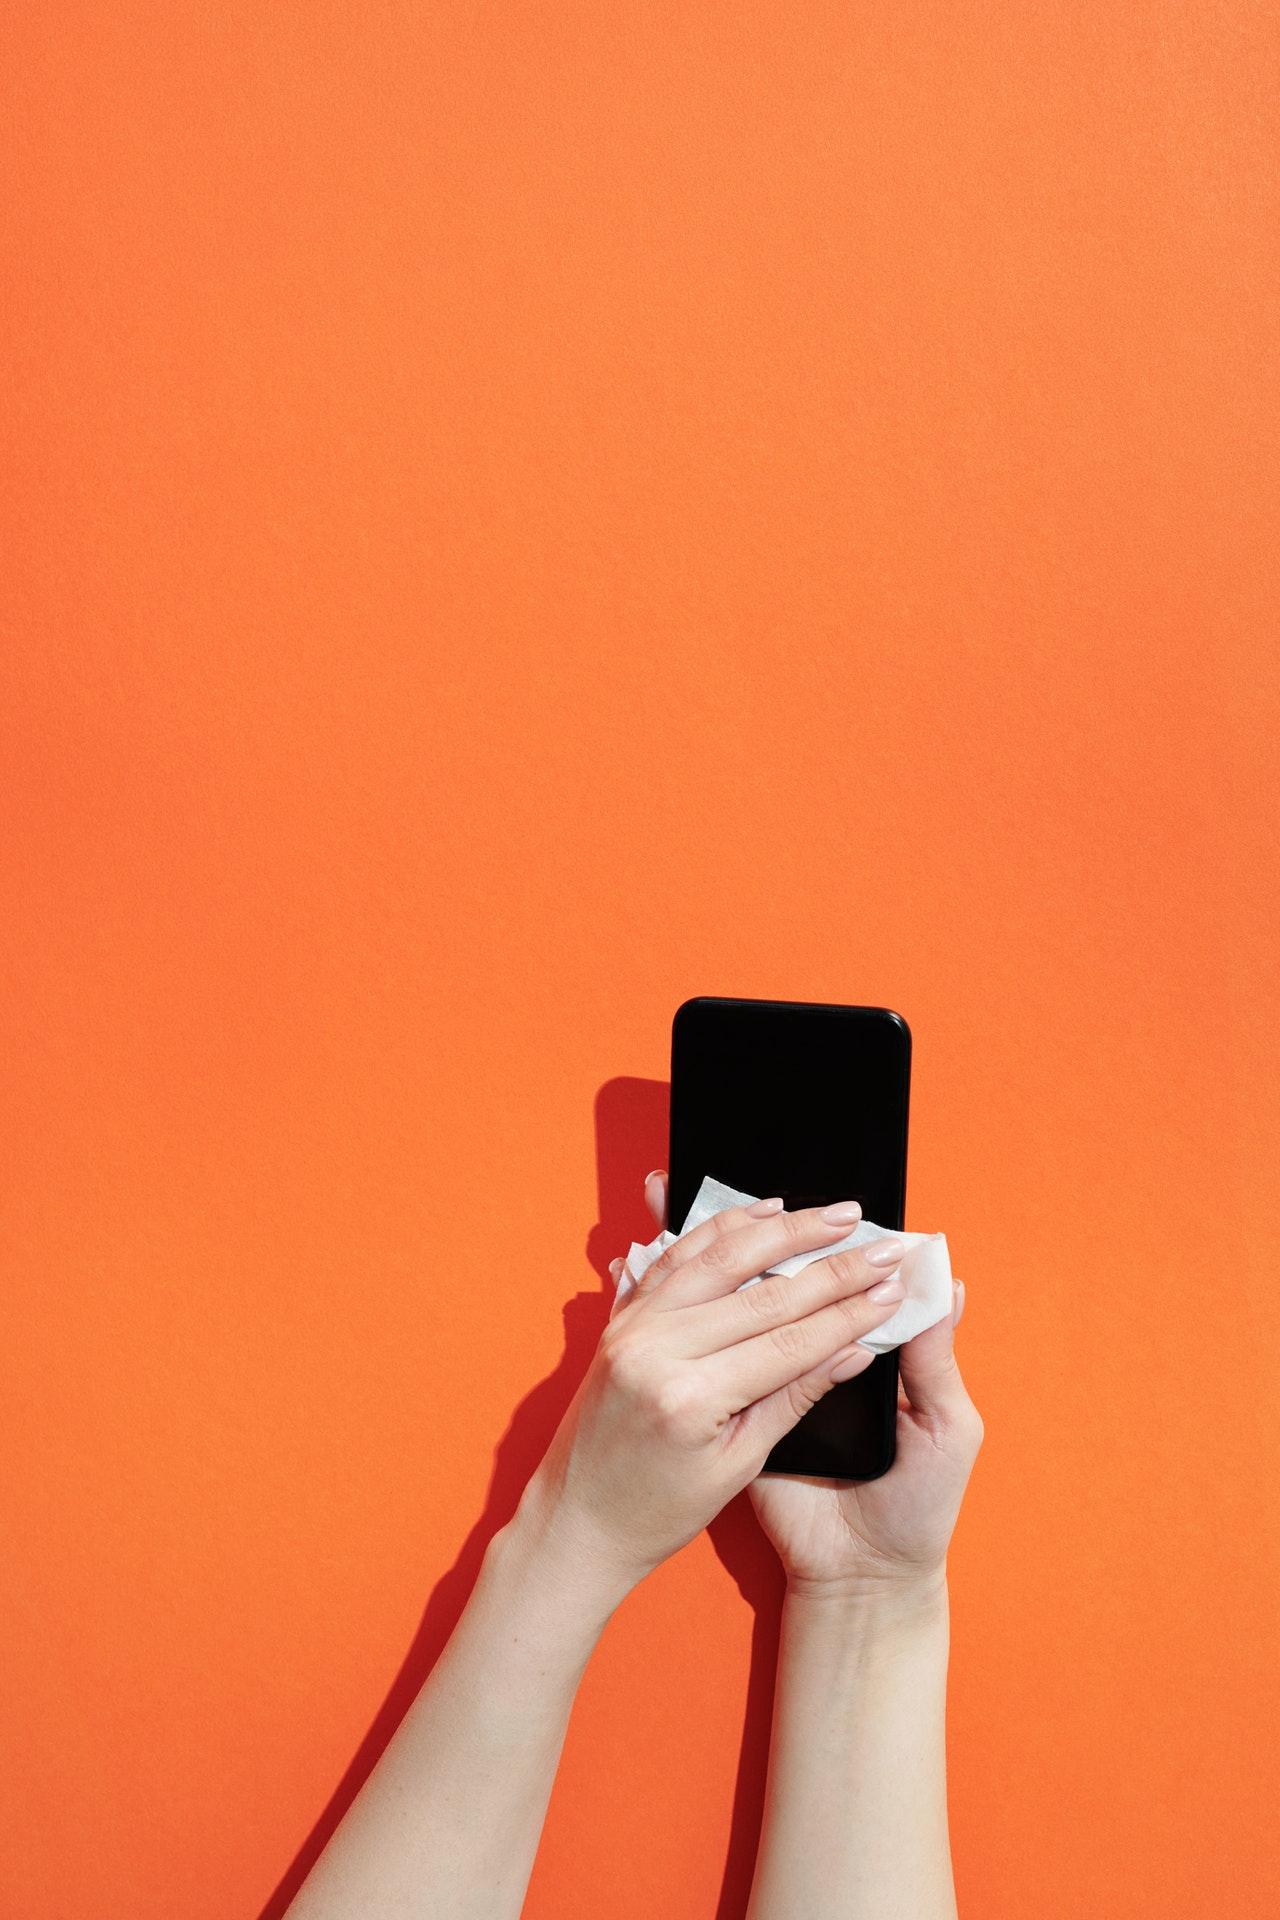 How to Disinfect Smartphones